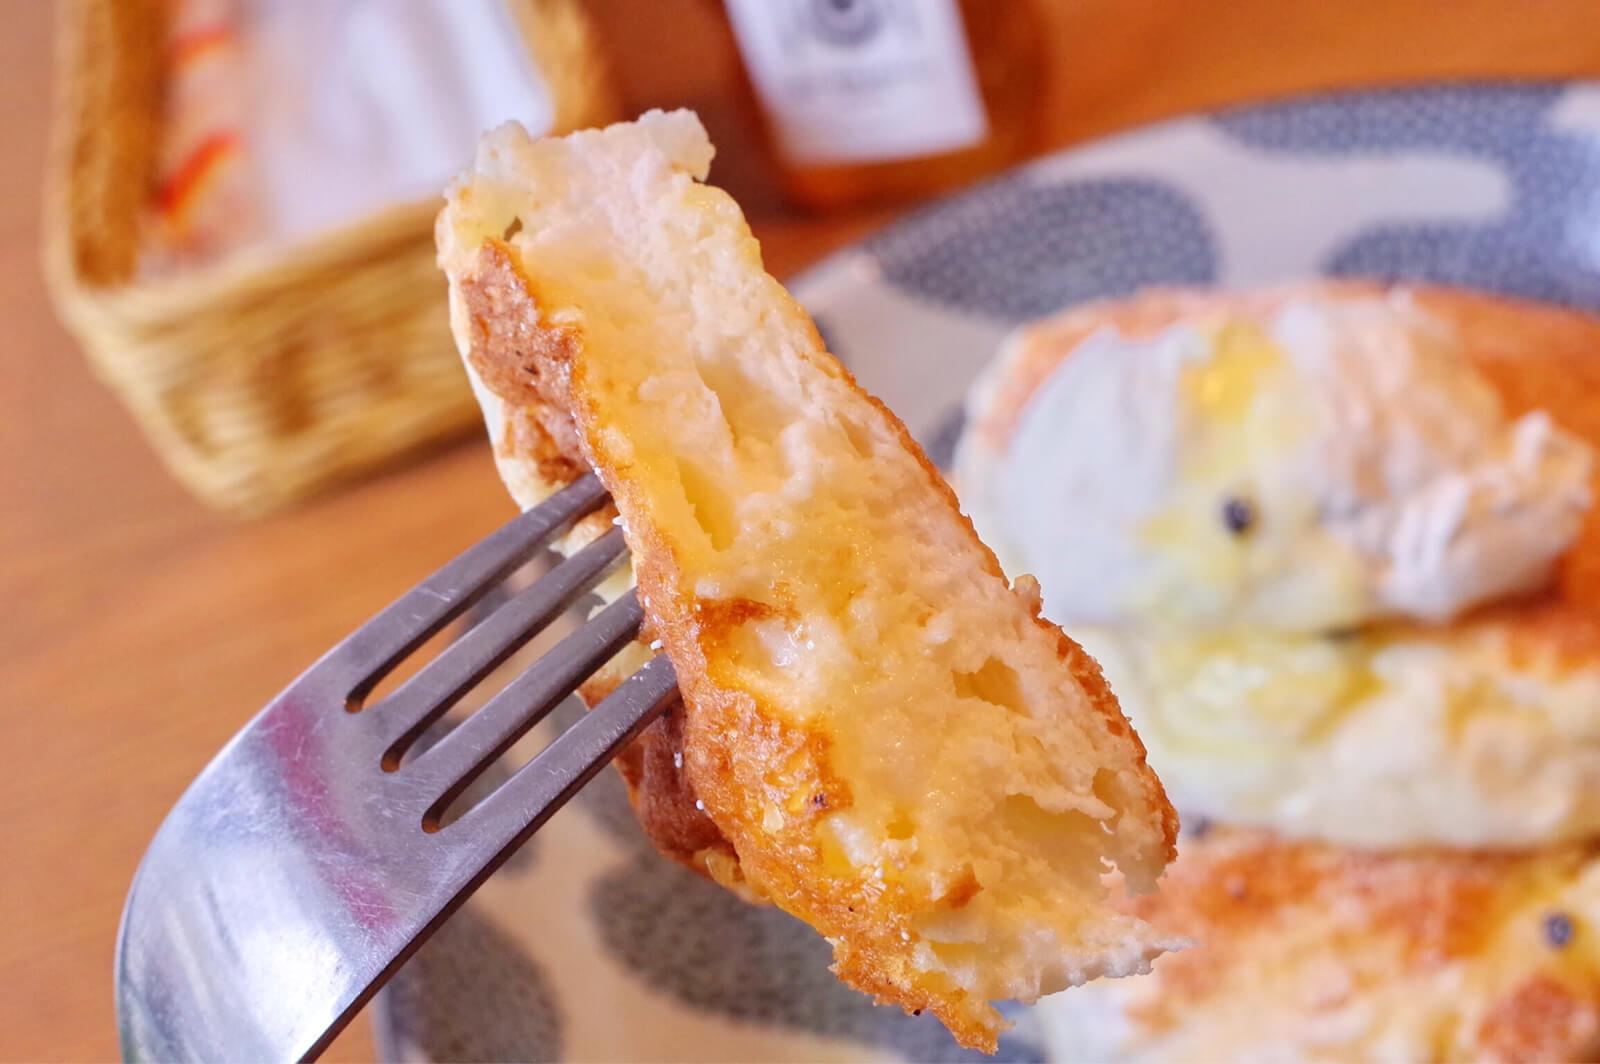 C&C BREAKFAST okinawa スフレパンケーキ